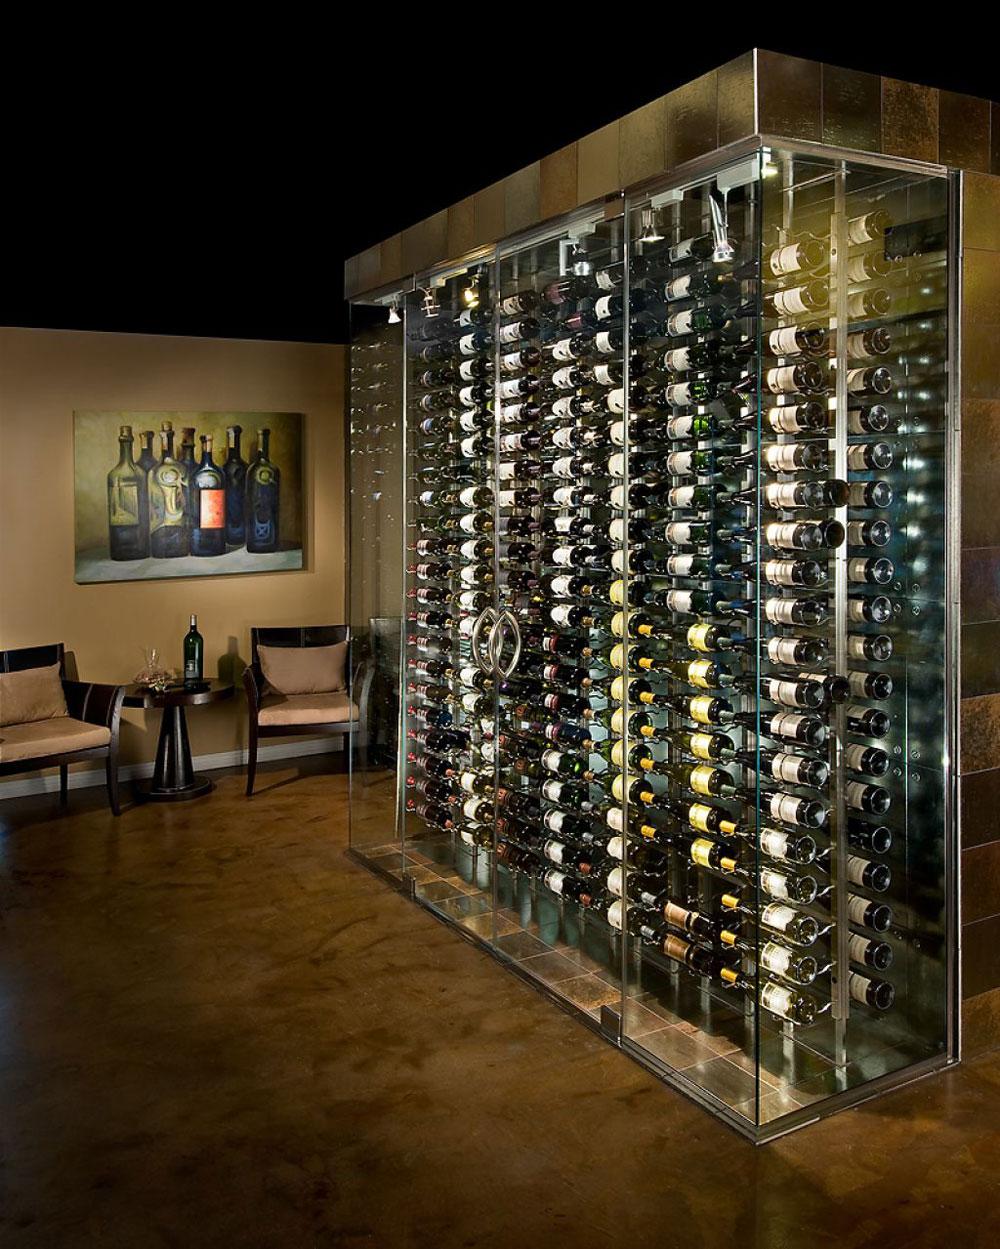 Wine cellar design ideas-6 wine cellar design ideas